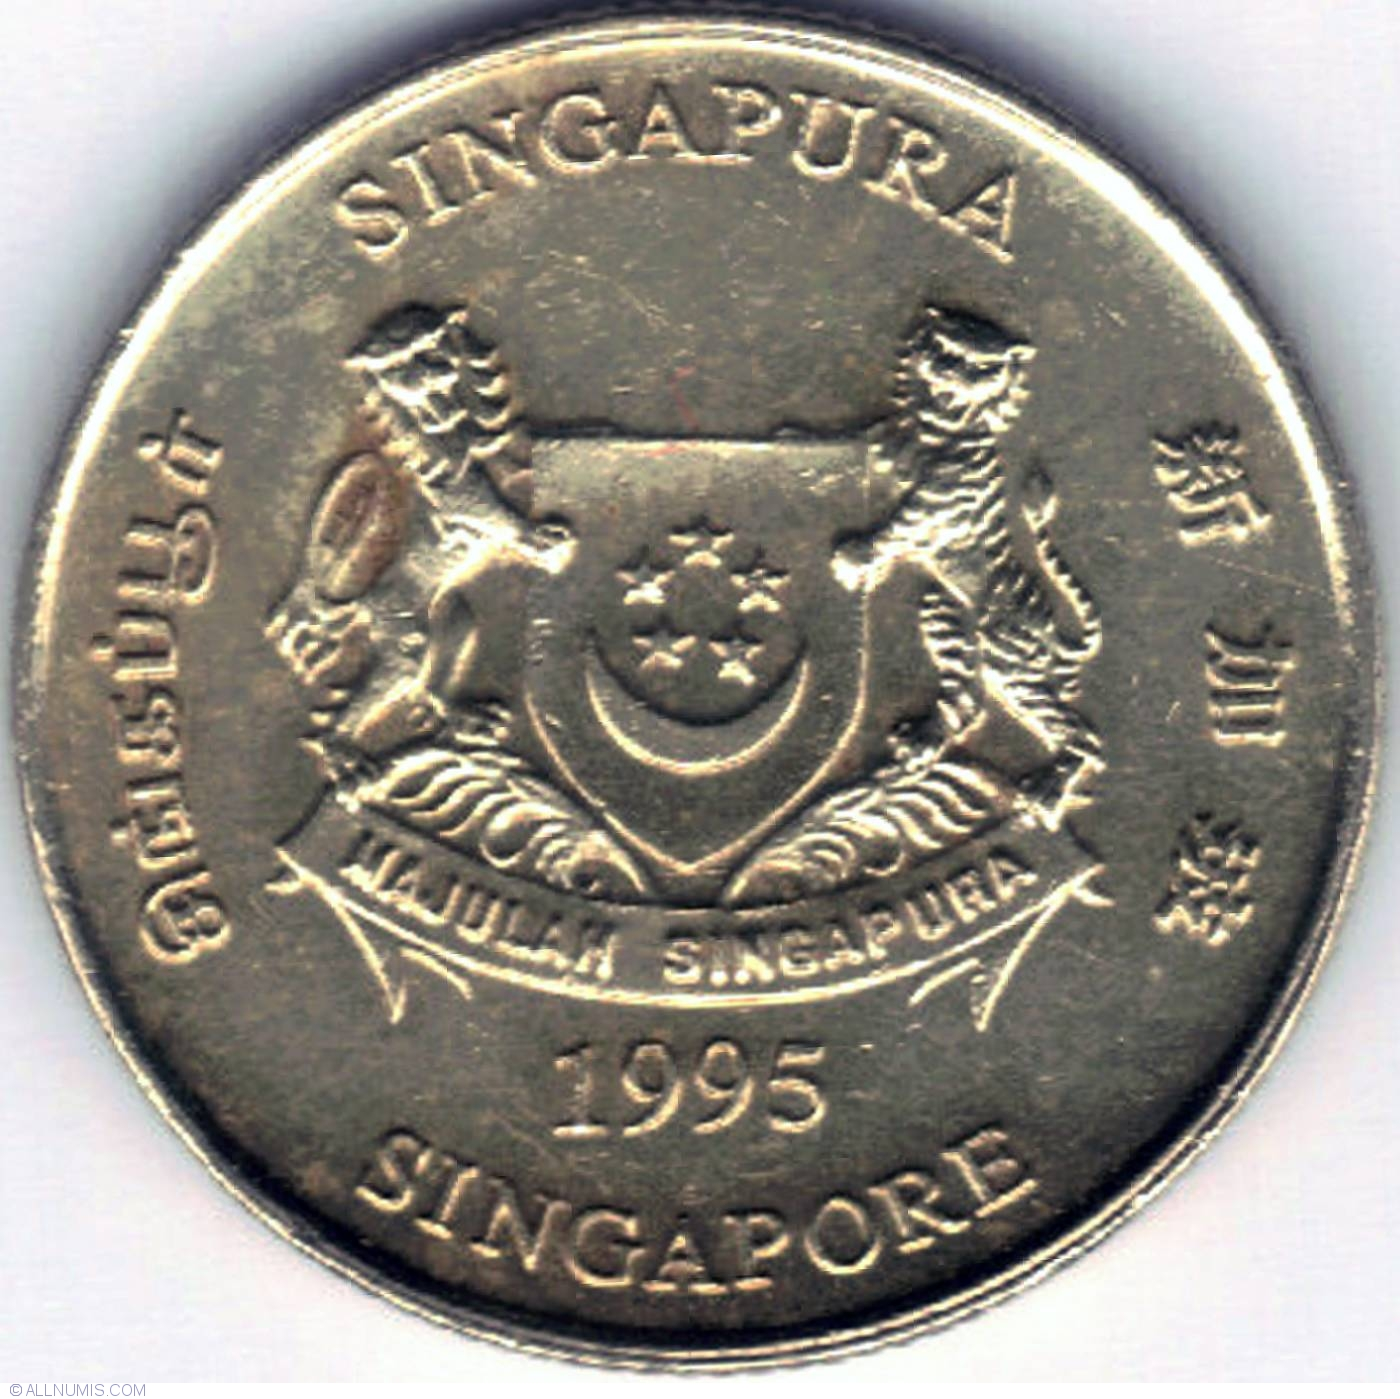 5 Cents 1995 Republic 1991 2000 Singapore Coin 9244